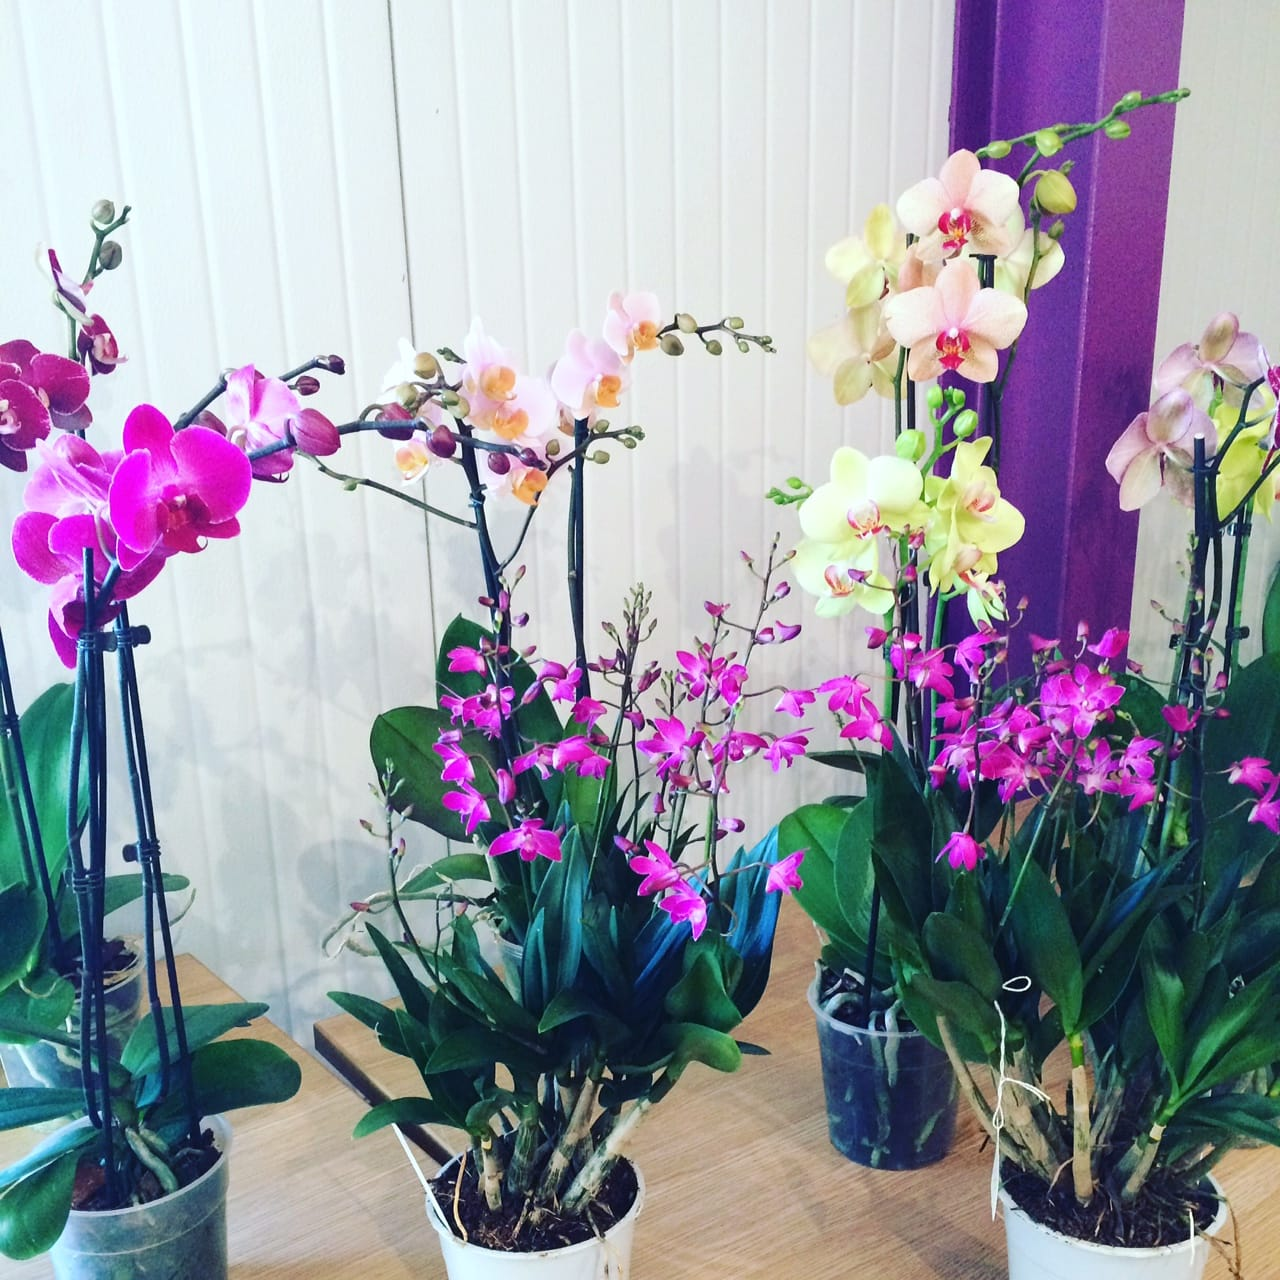 Alitex Orchid Talk from McBean's